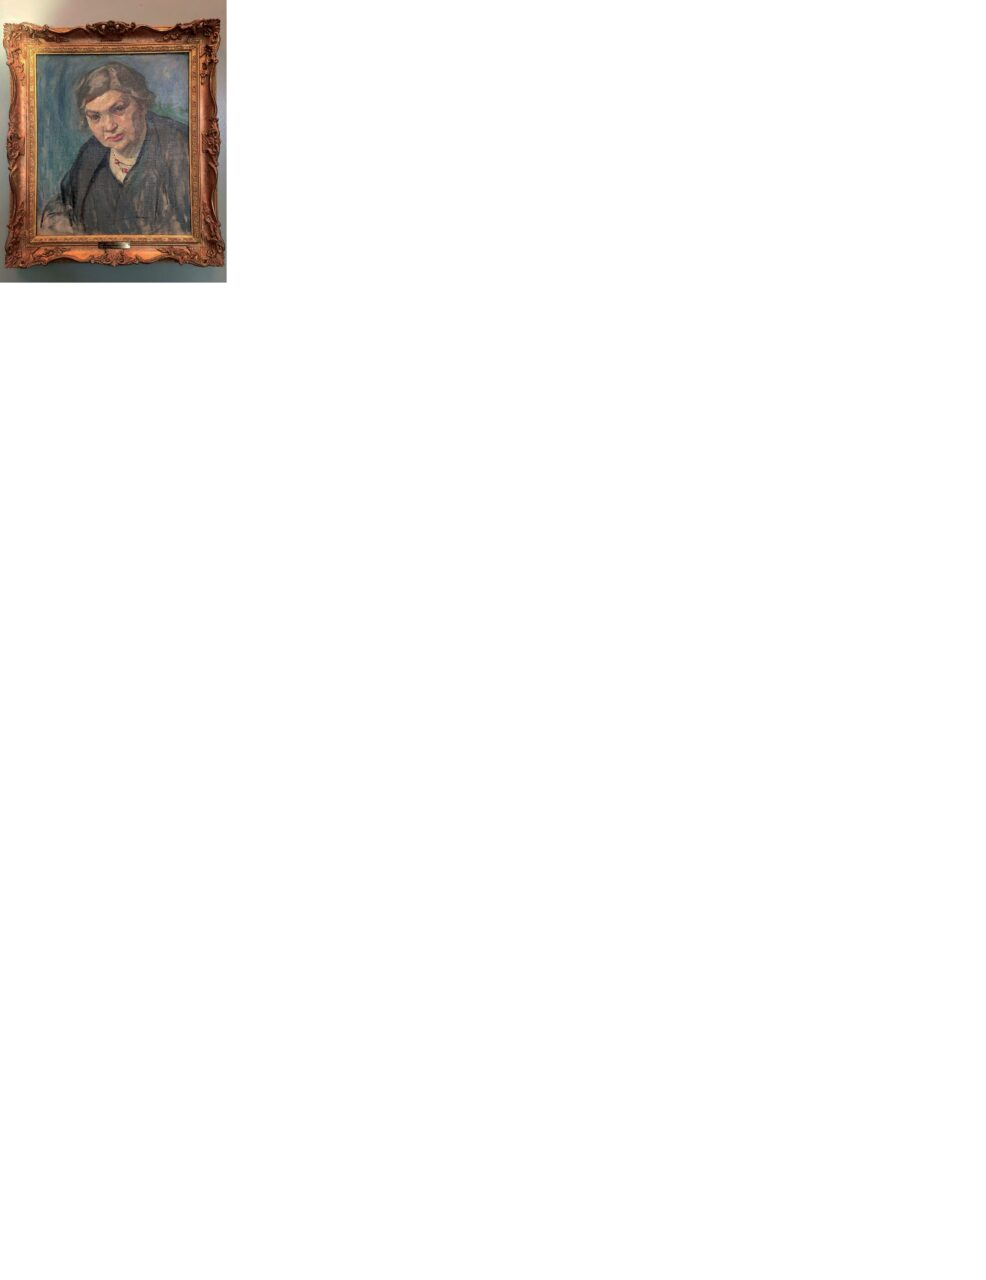 Mary Alexandra Bell Eastlake, Portrait of Maude Abbott, no date, oil on canvas, 20 × 17